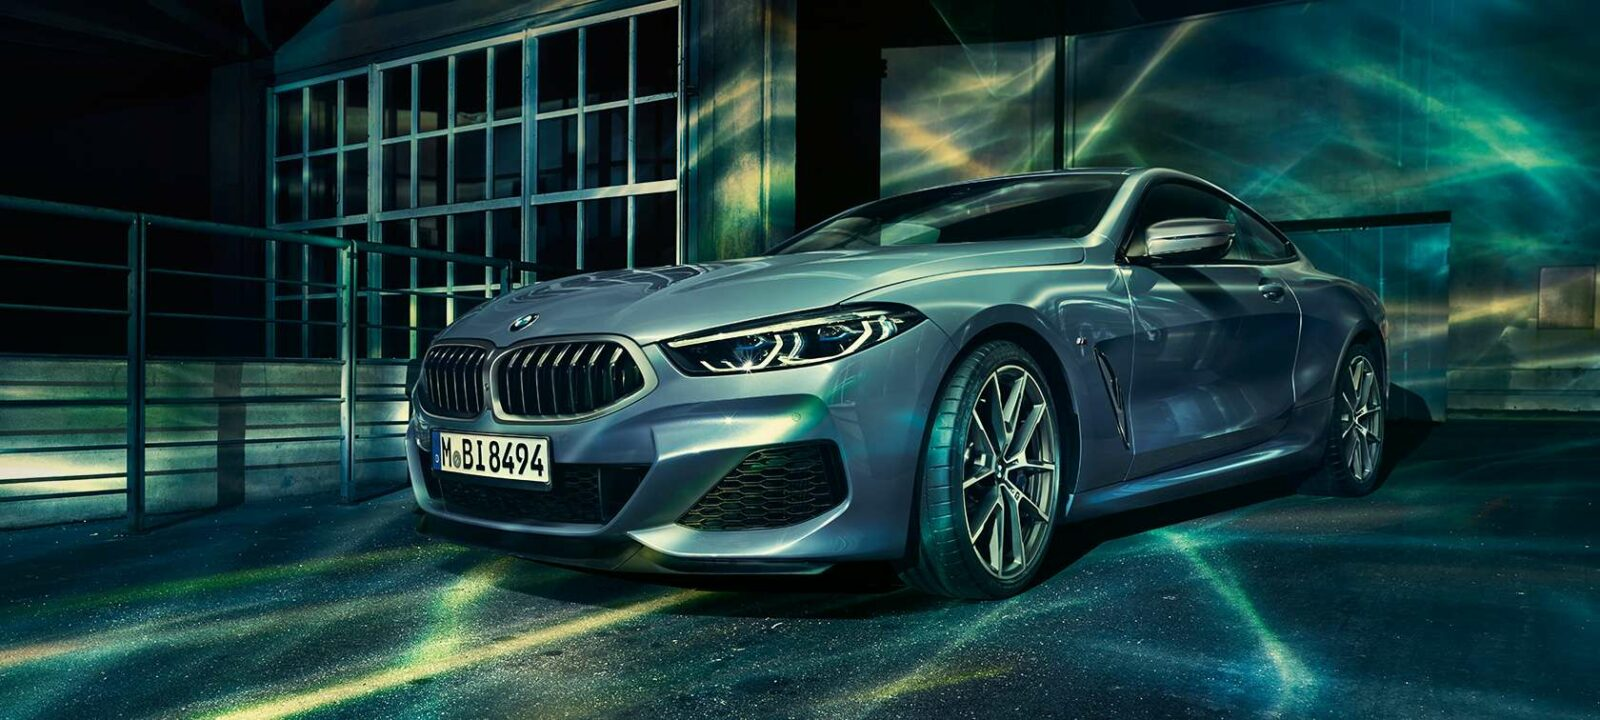 NUOVA BMW SERIE 8 COUPE' :